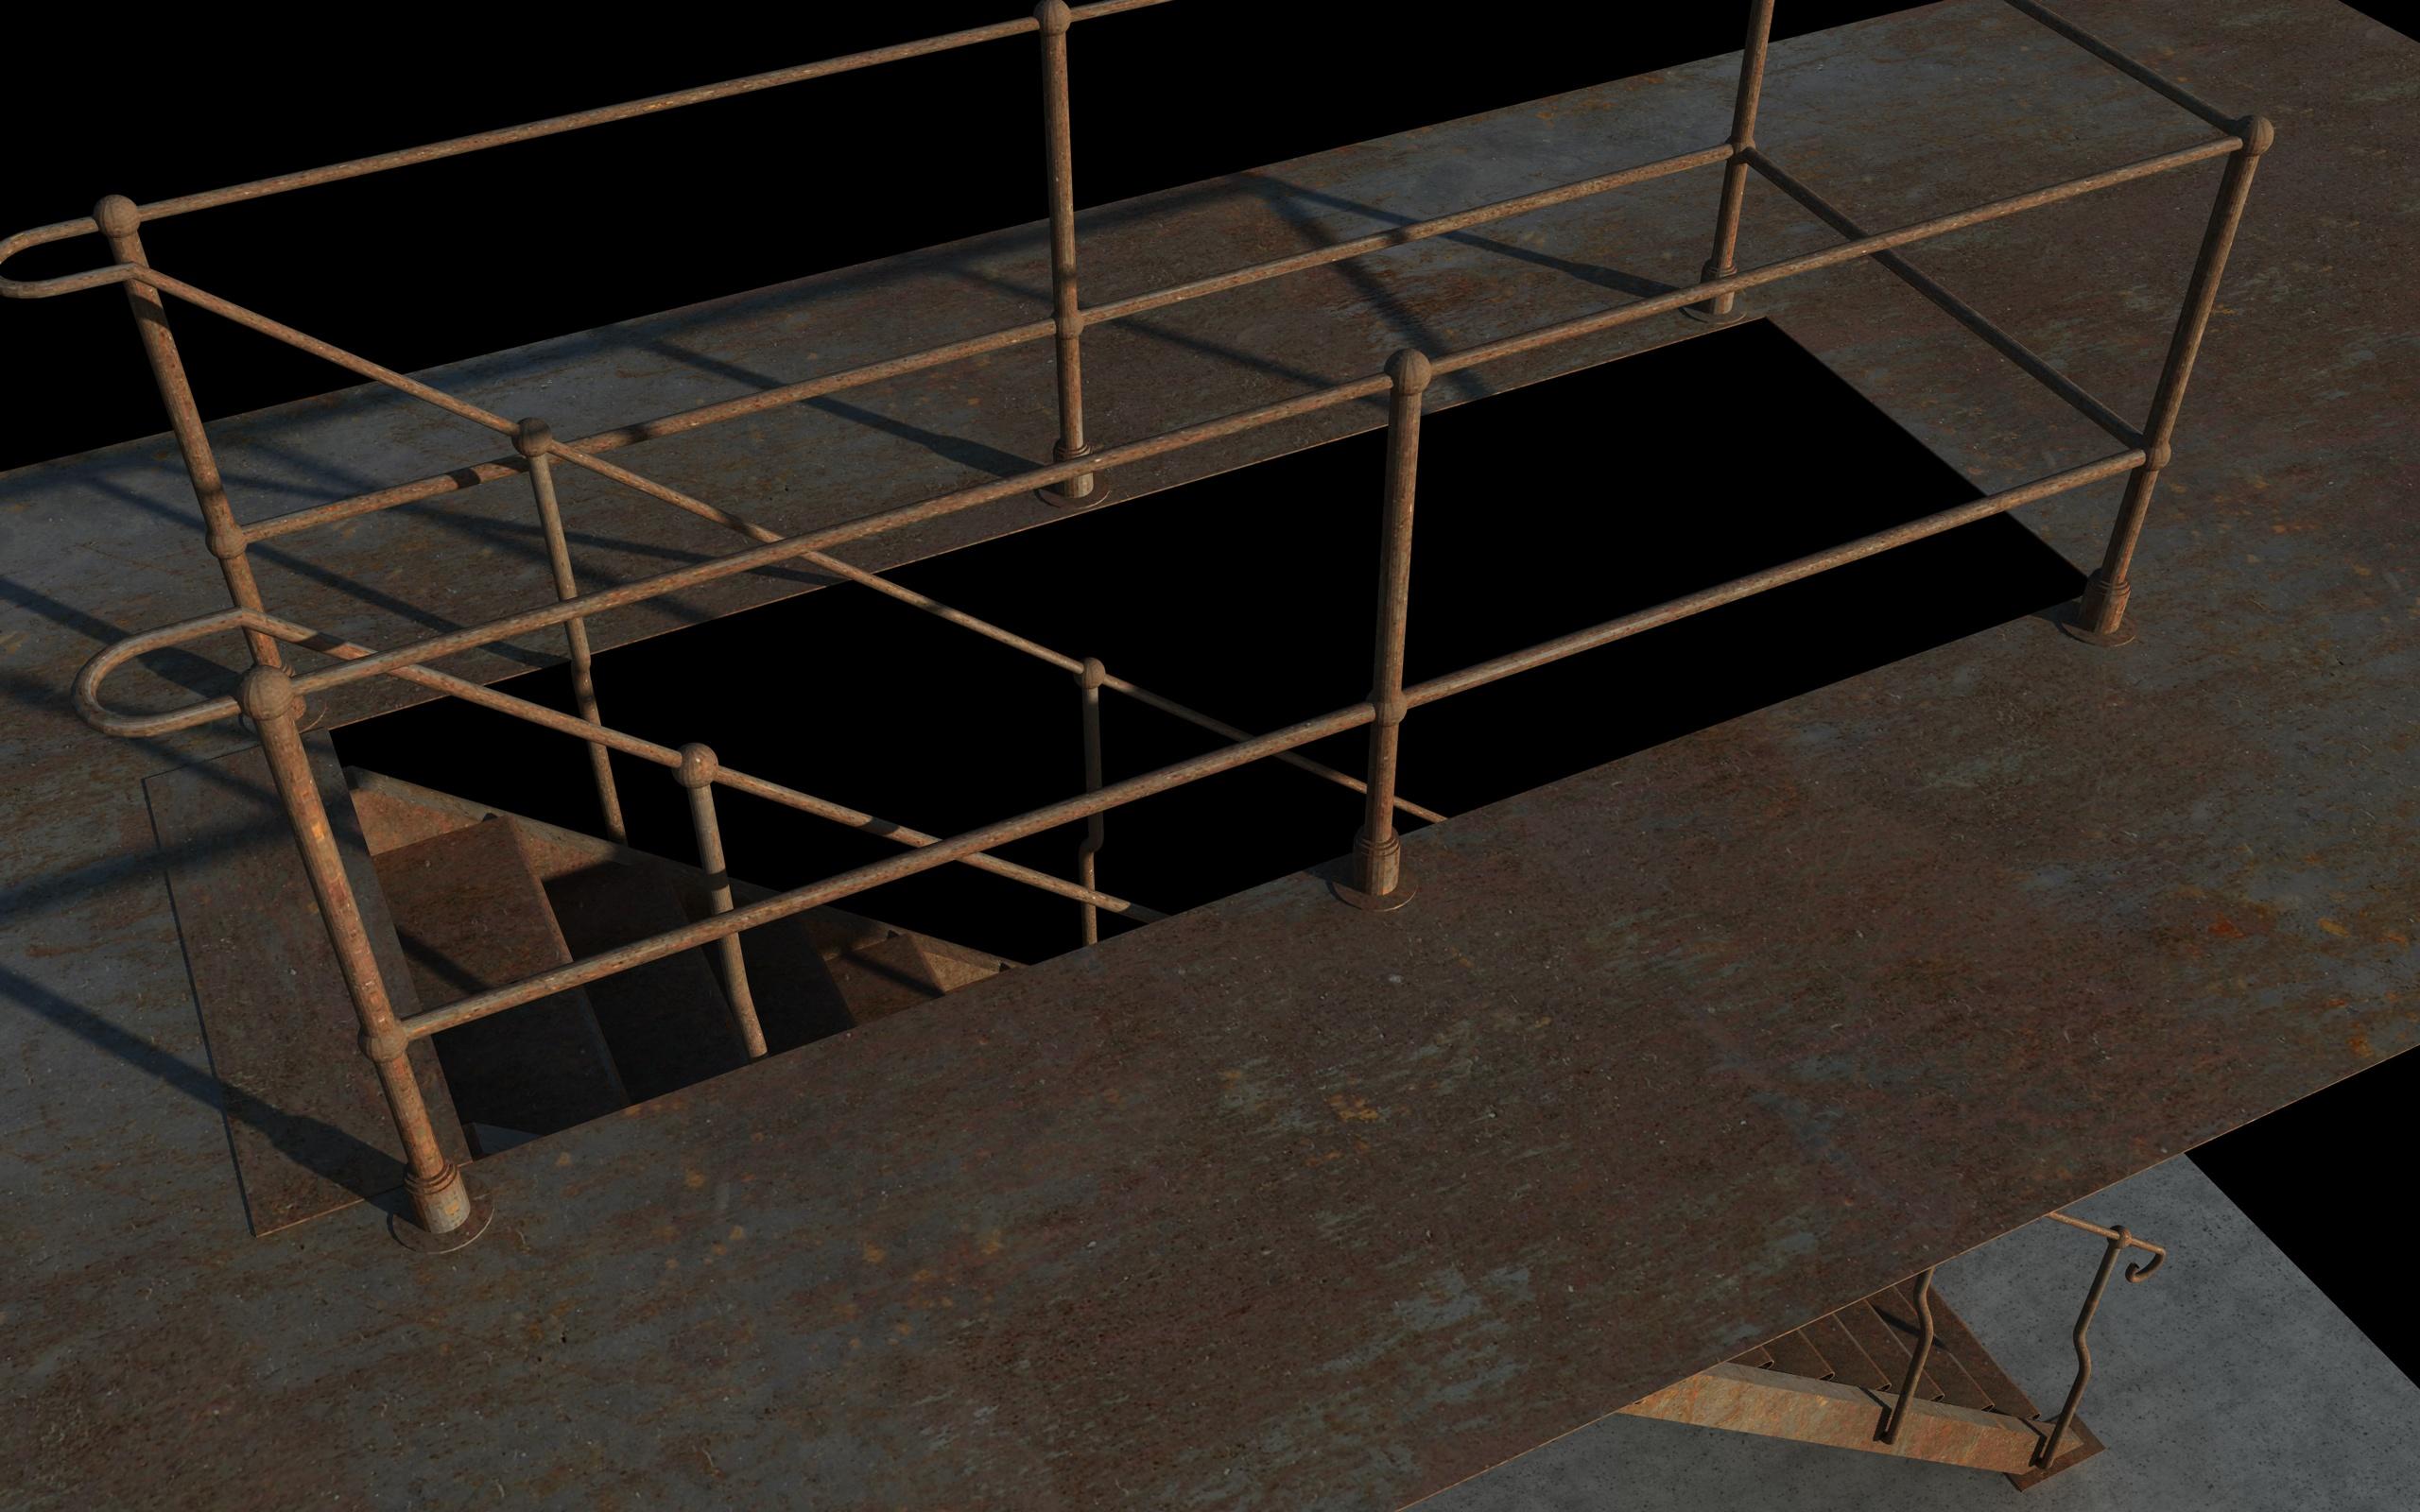 iron stair 3d obj 3d model 3ds dxf c4d skp obj 148391